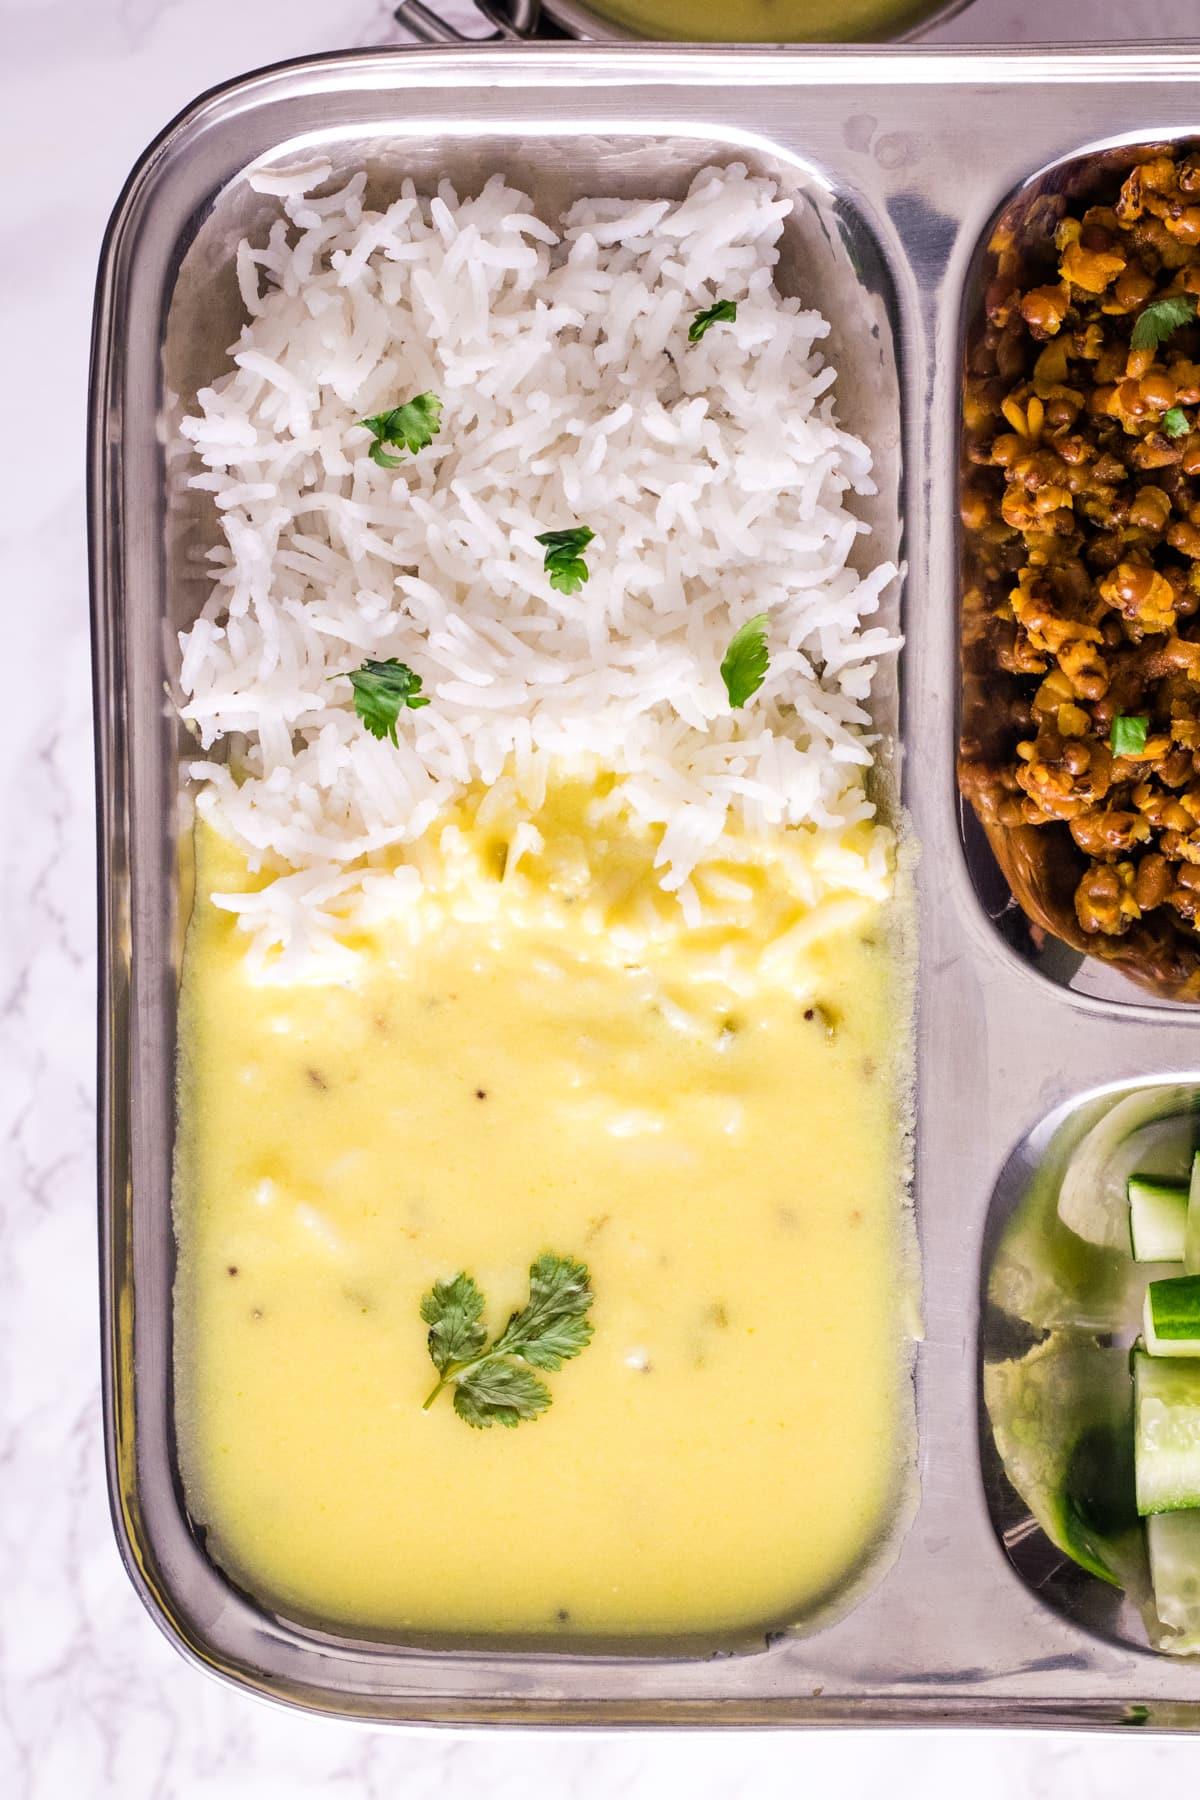 Gujarati kadhi served with rice in a steel plate.